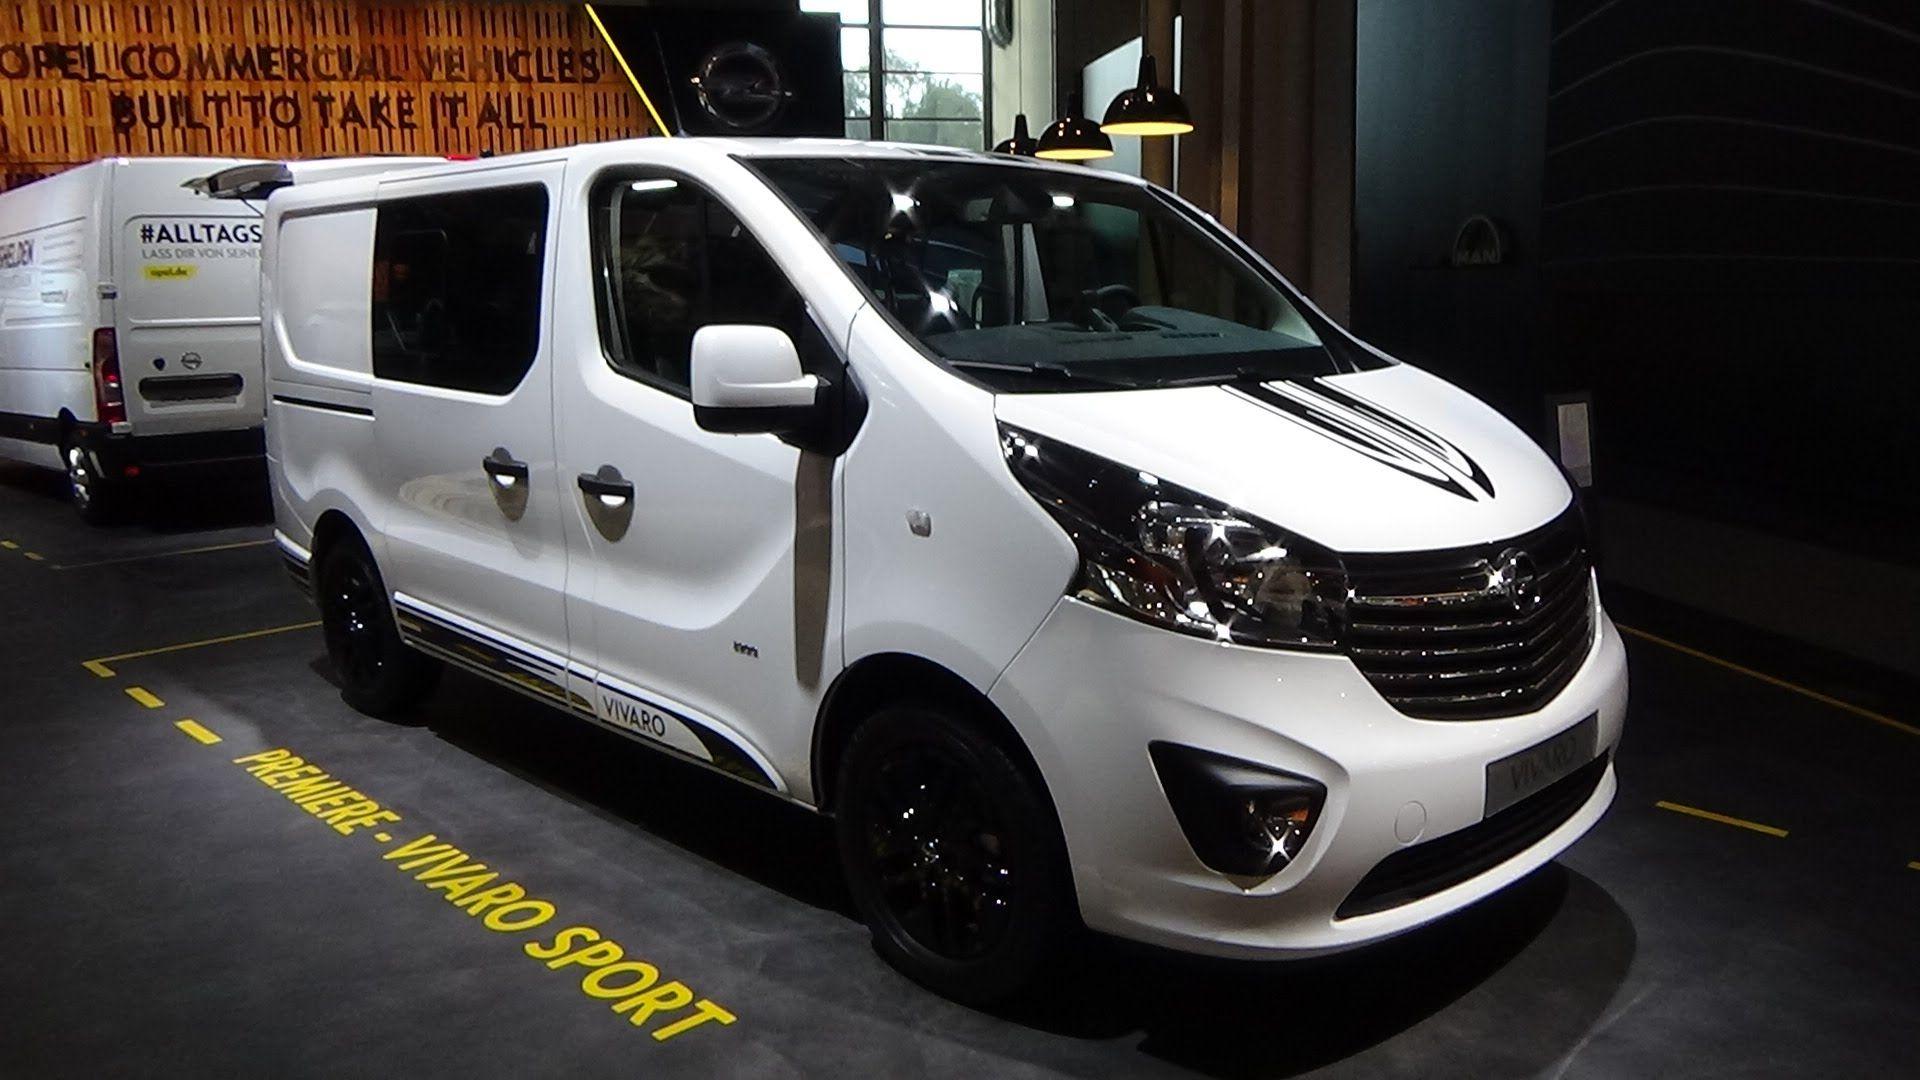 bc65ece8ed 2017 Opel Vivaro Sport - Exterior and Interior - IAA Hannover 2016 ...